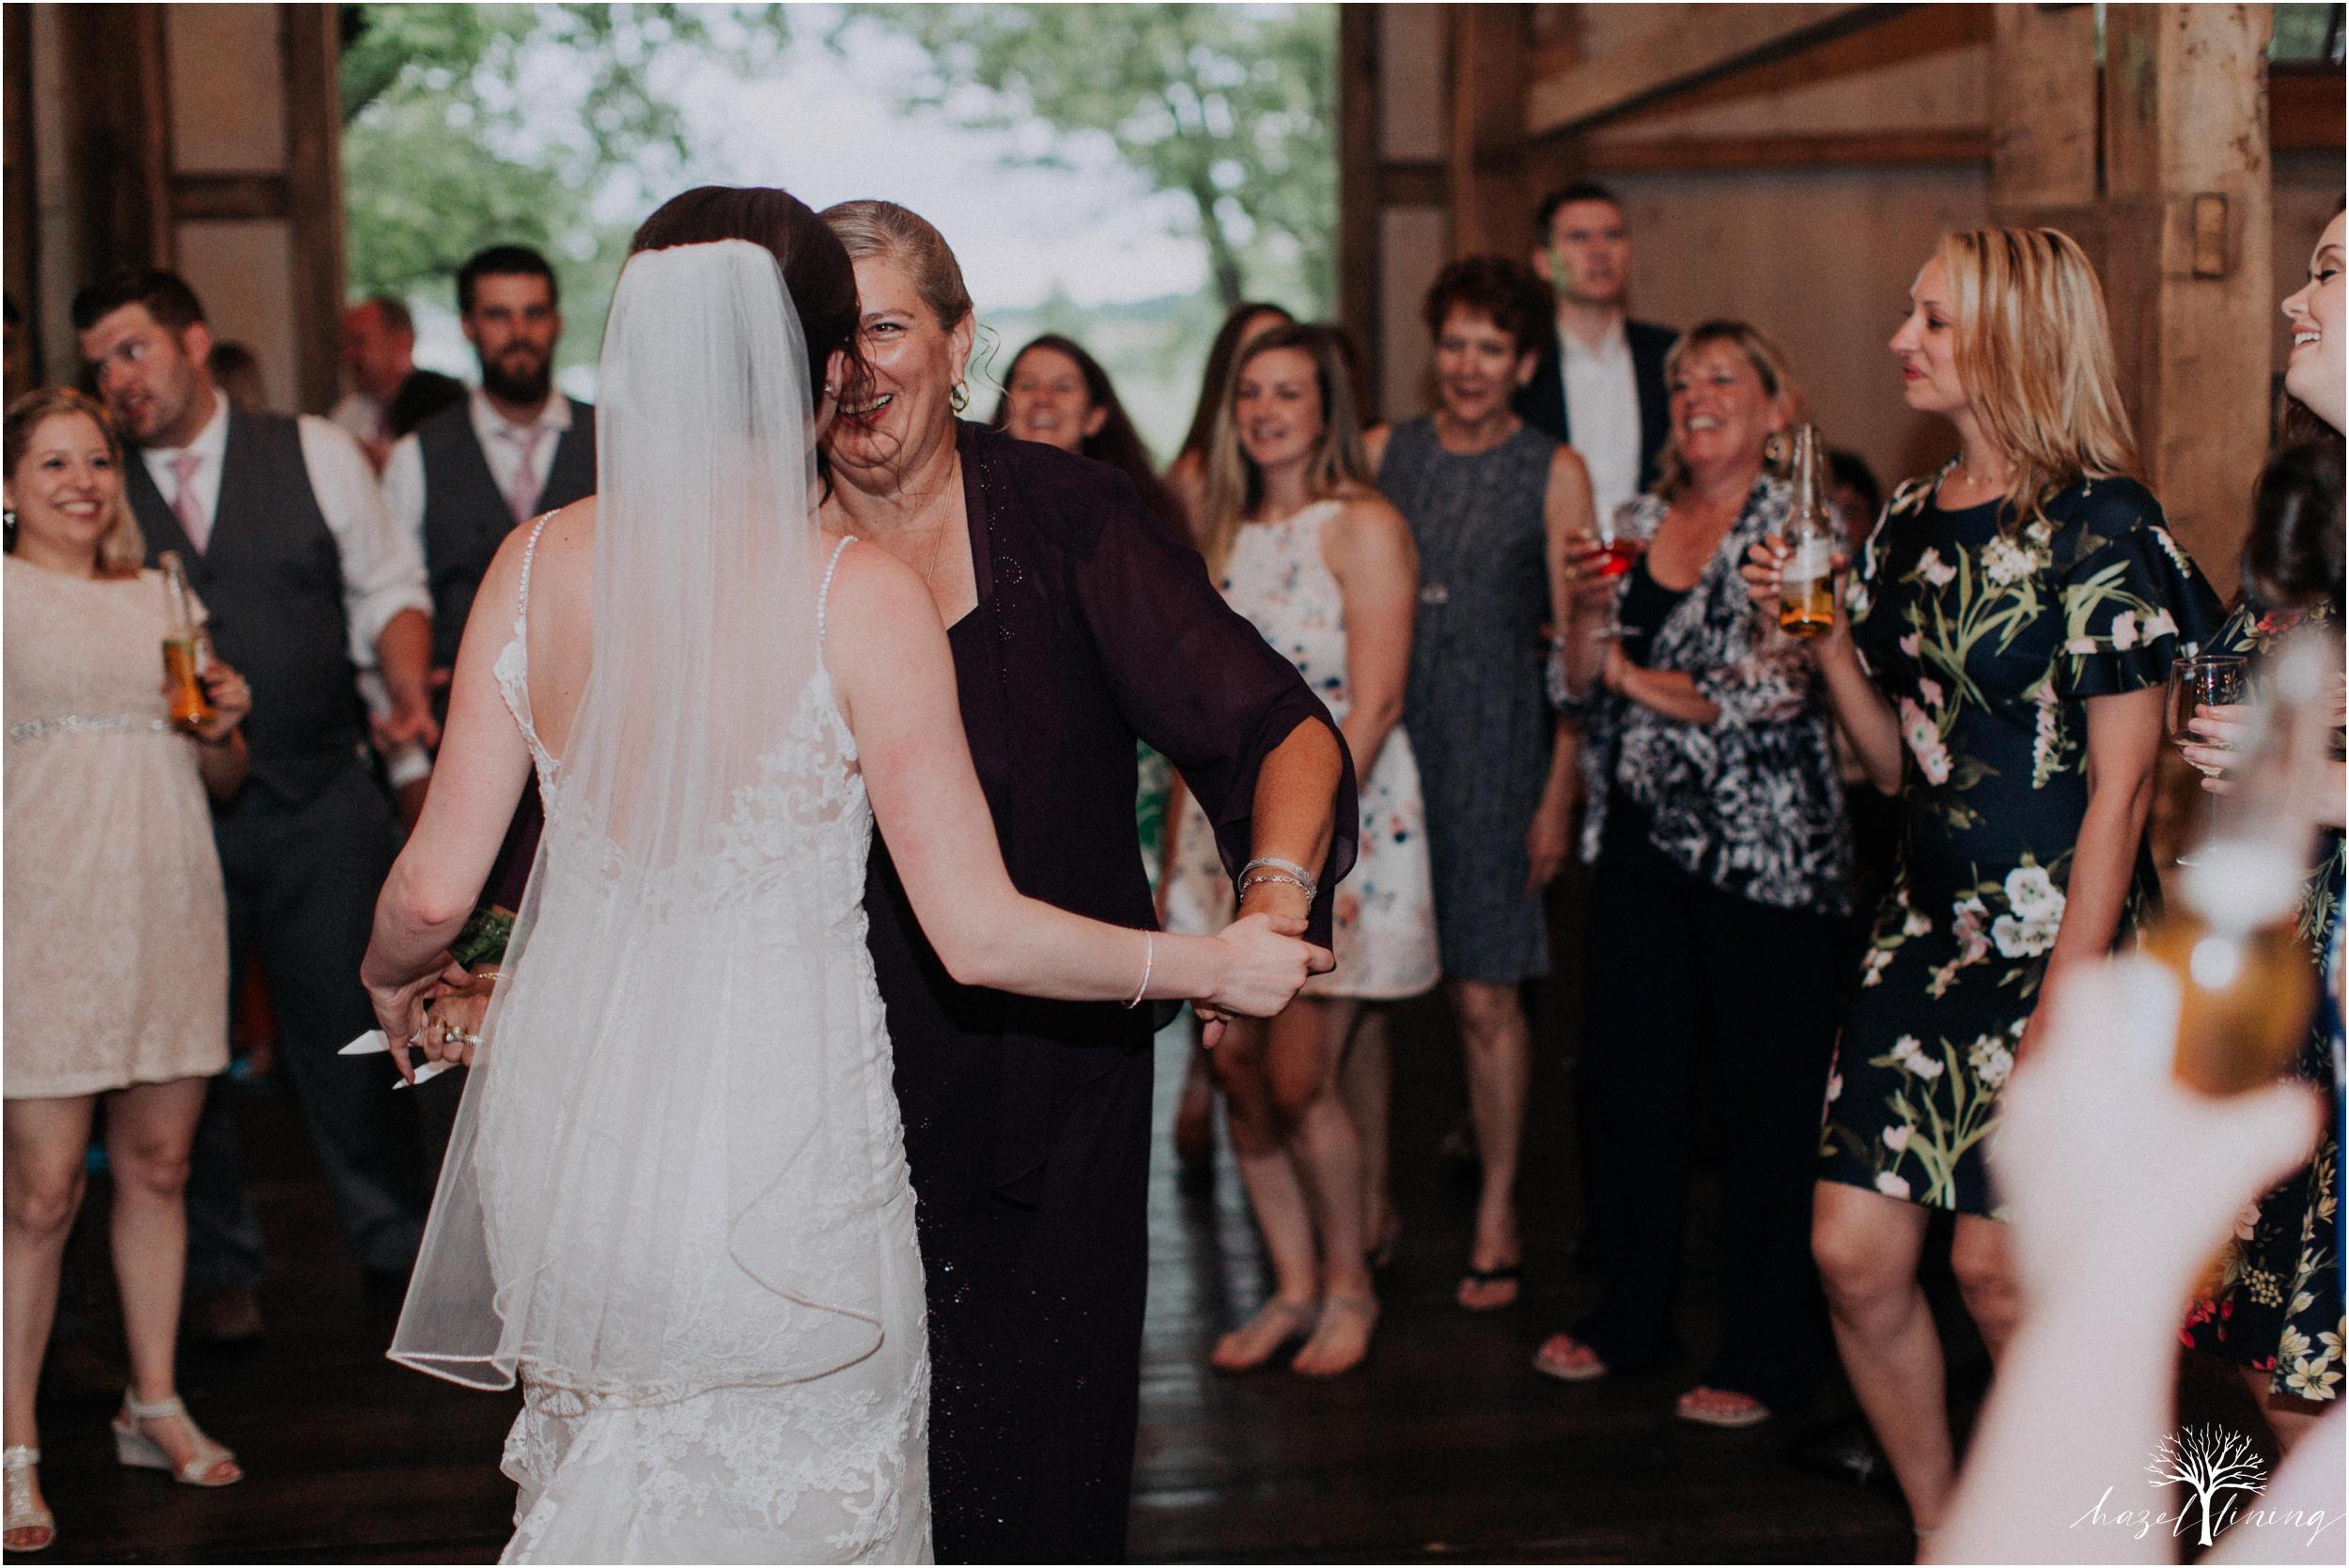 hazel-lining-travel-wedding-elopement-photography-lisa-landon-shoemaker-the-farm-bakery-and-events-bucks-county-quakertown-pennsylvania-summer-country-outdoor-farm-wedding_0154.jpg